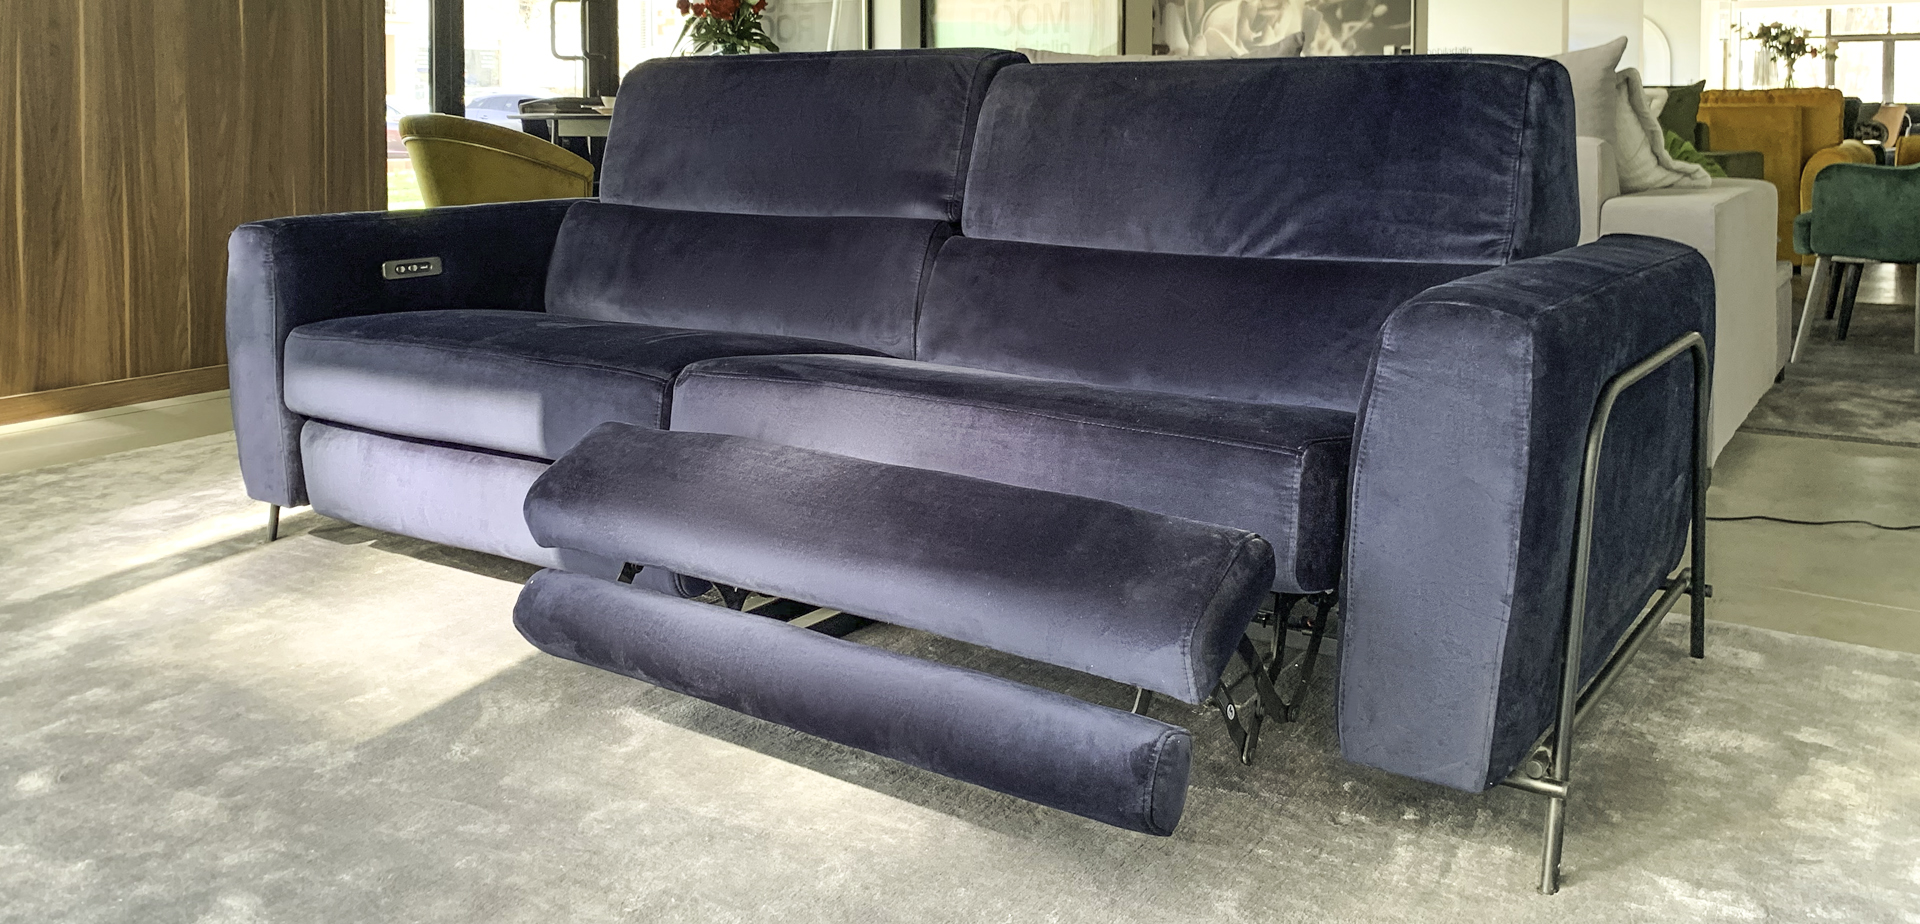 canapea-mossa-3-locuri-2-recliner-electric-01.jpg